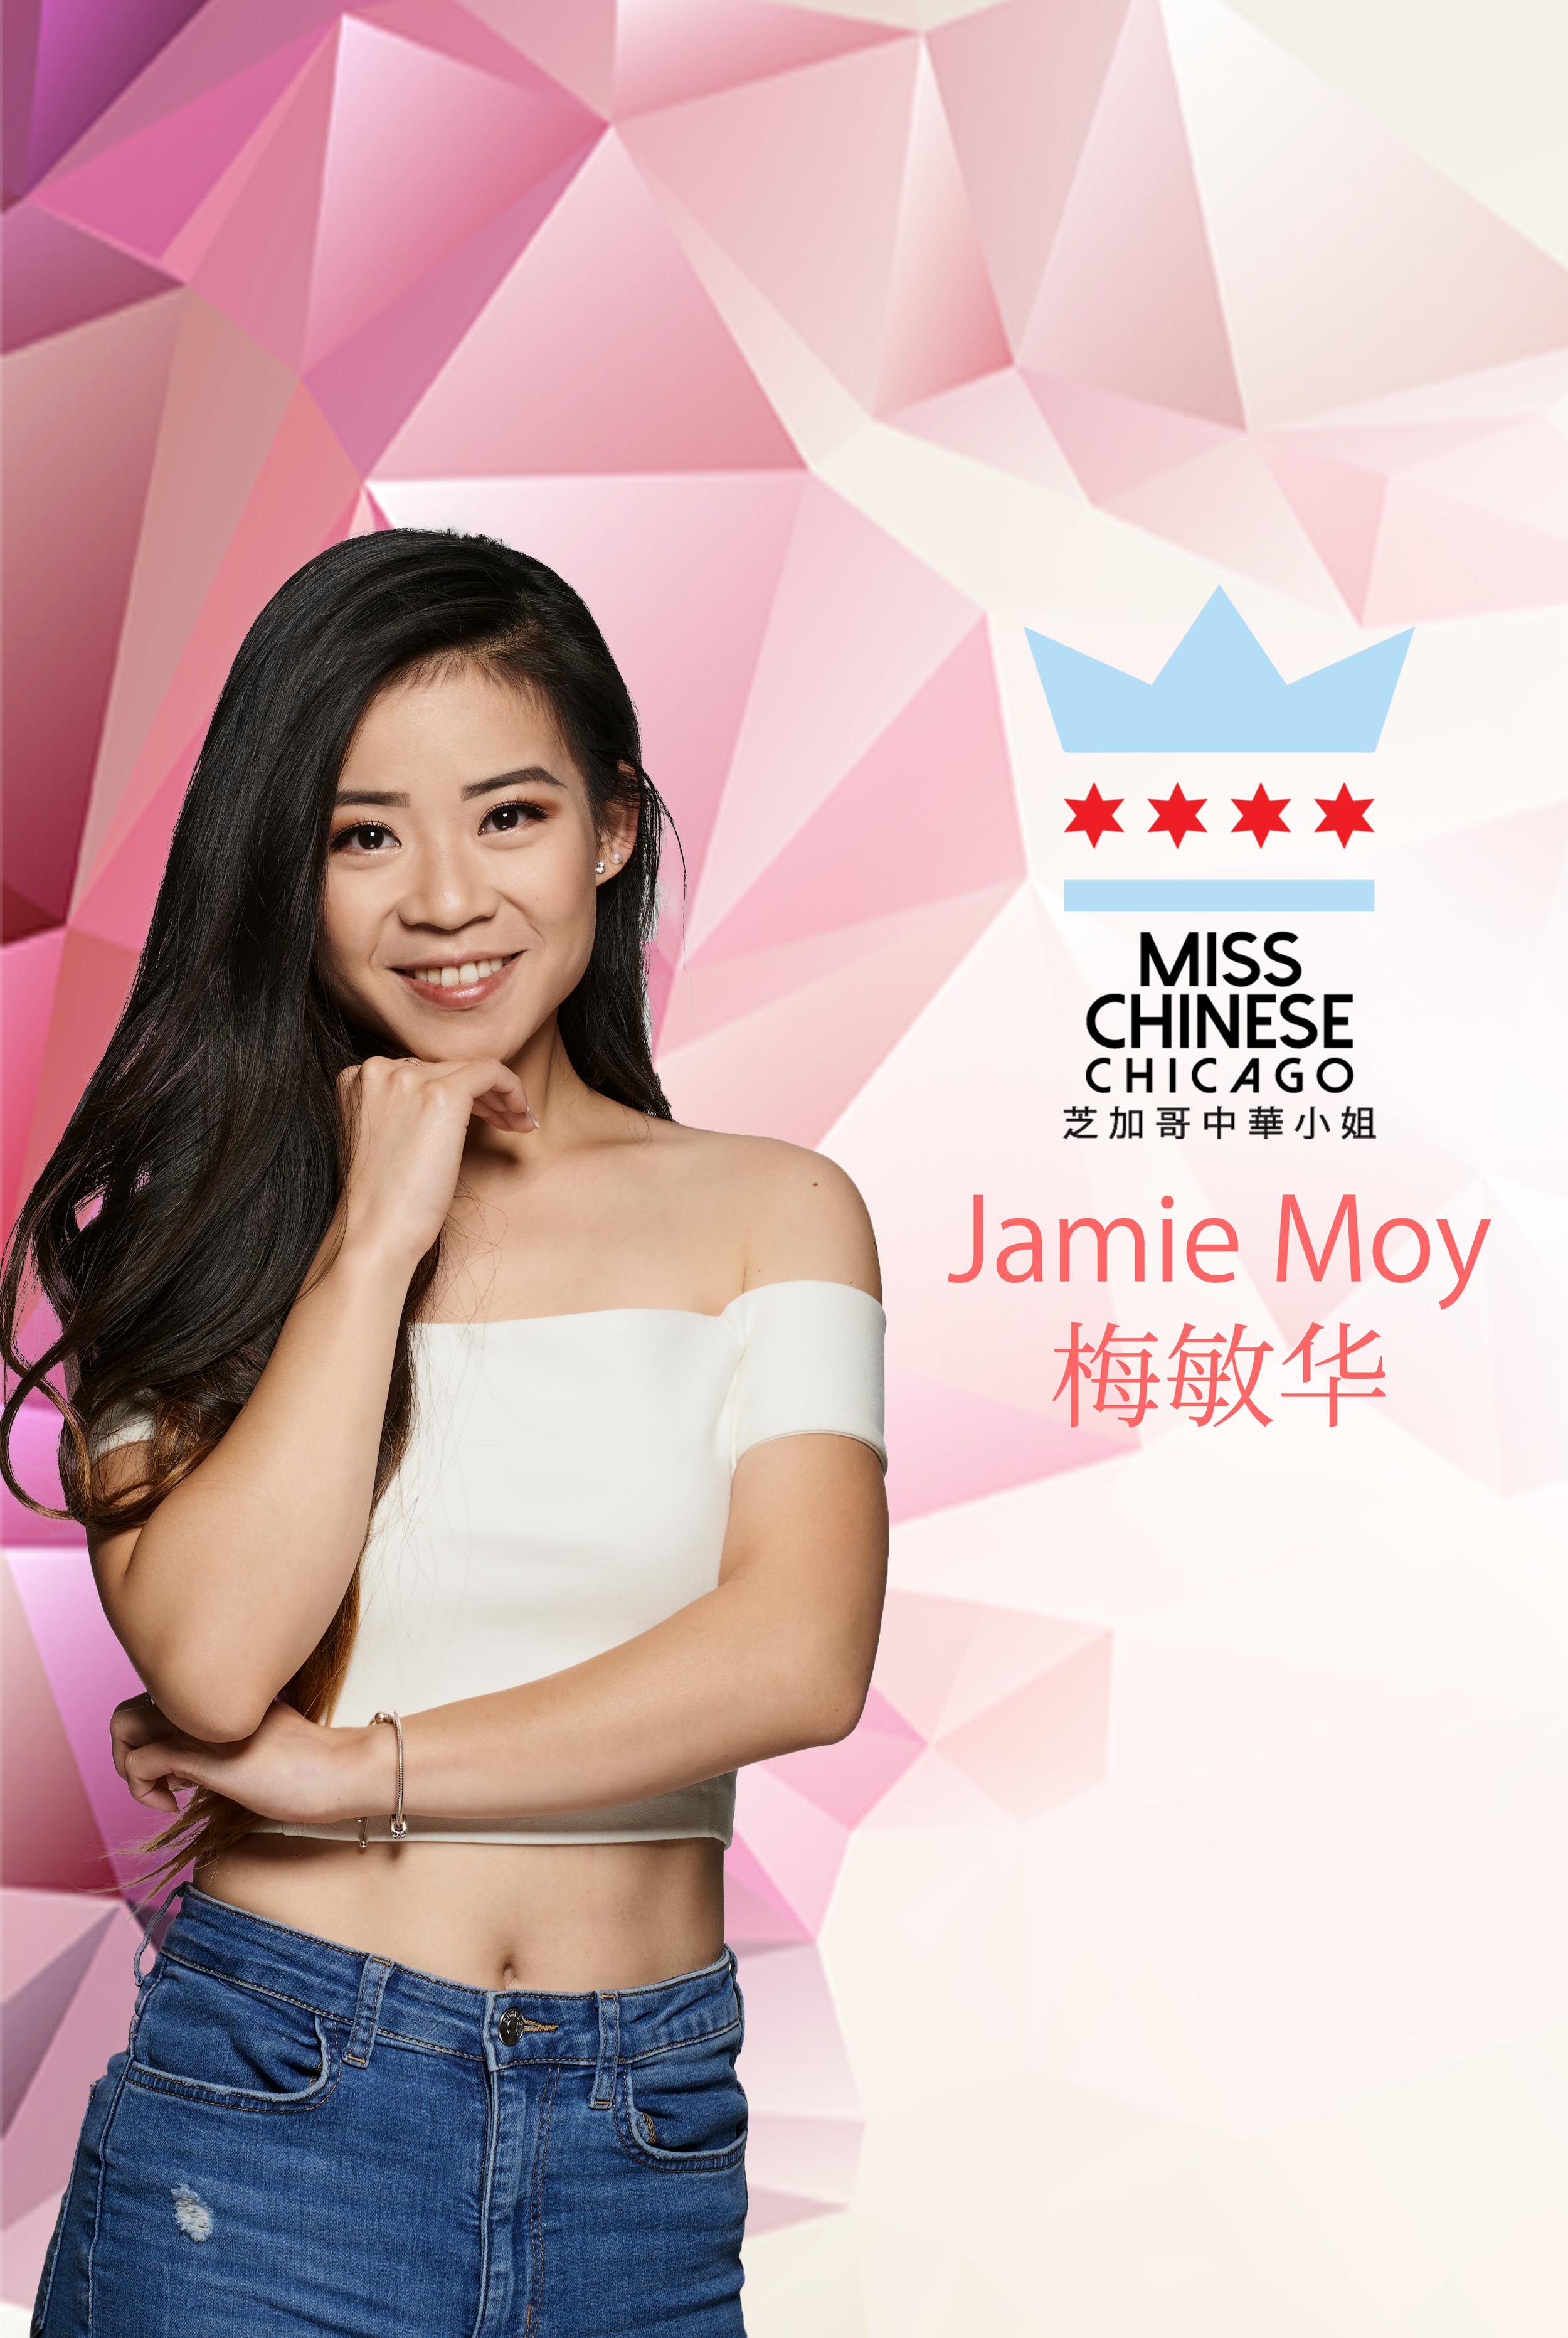 JamieMoy_MissChineseChicago2018.png